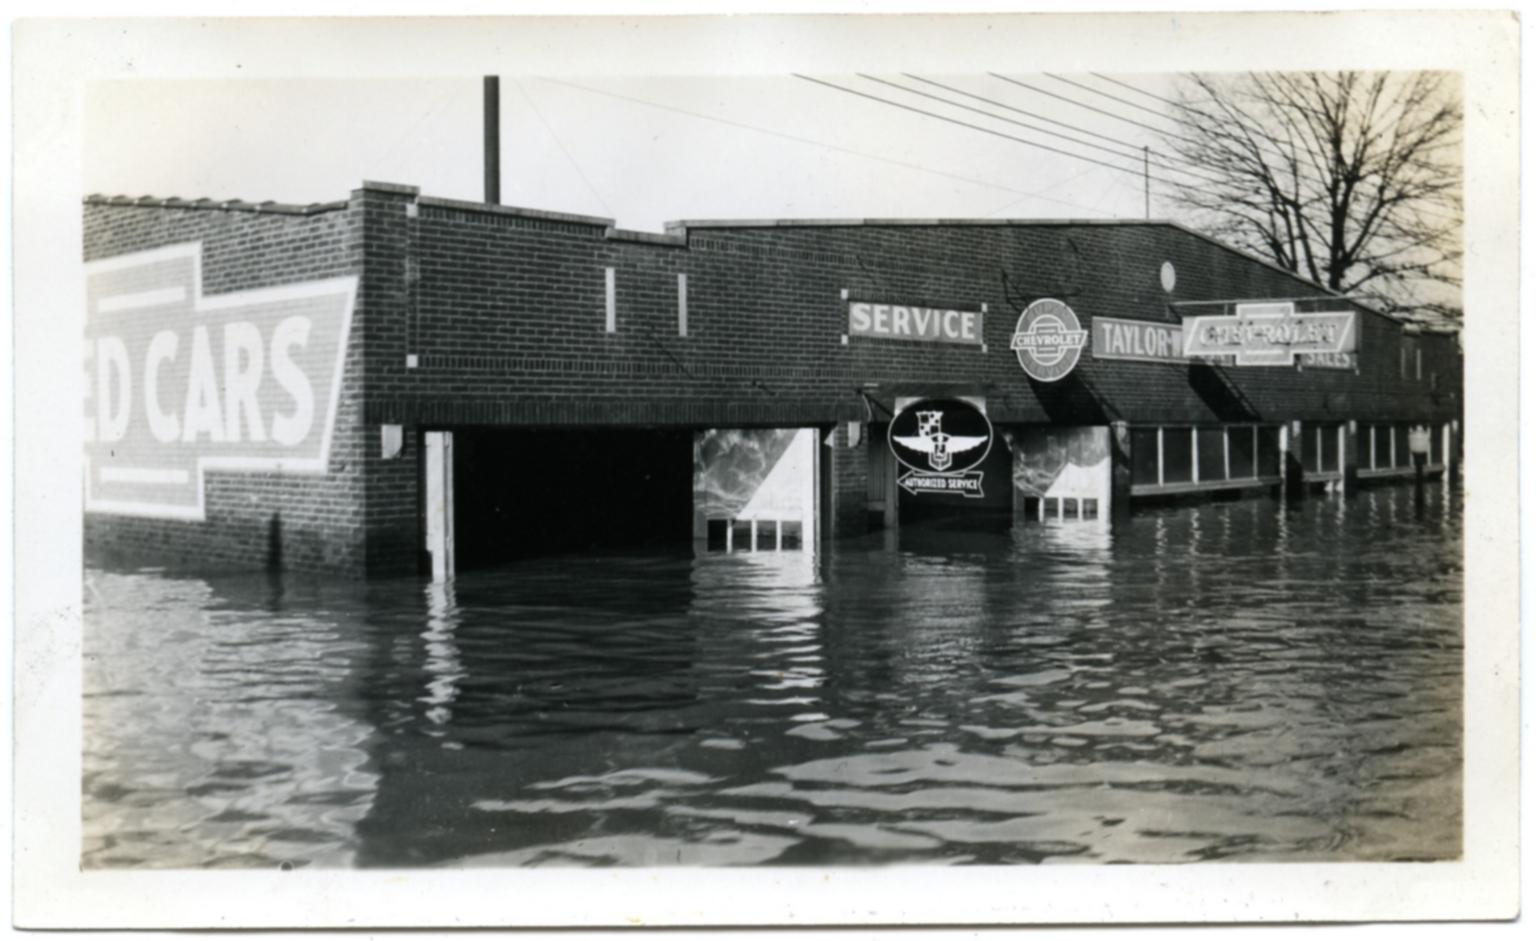 Car dealership in Paducah during '37 flood.